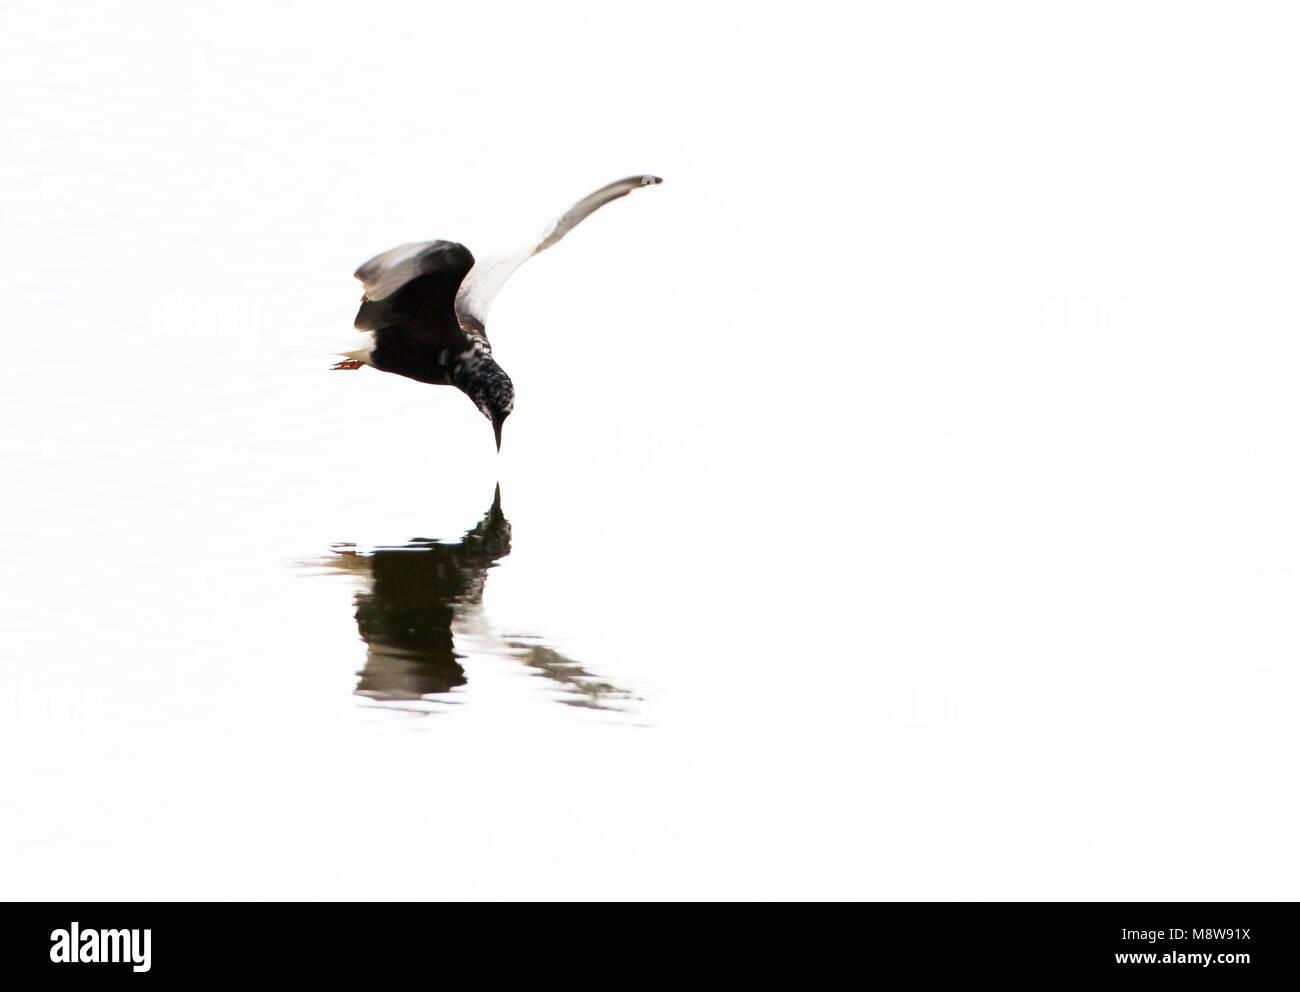 Witvleugelstern vliegend; White-winged Black Tern flying - Stock Image